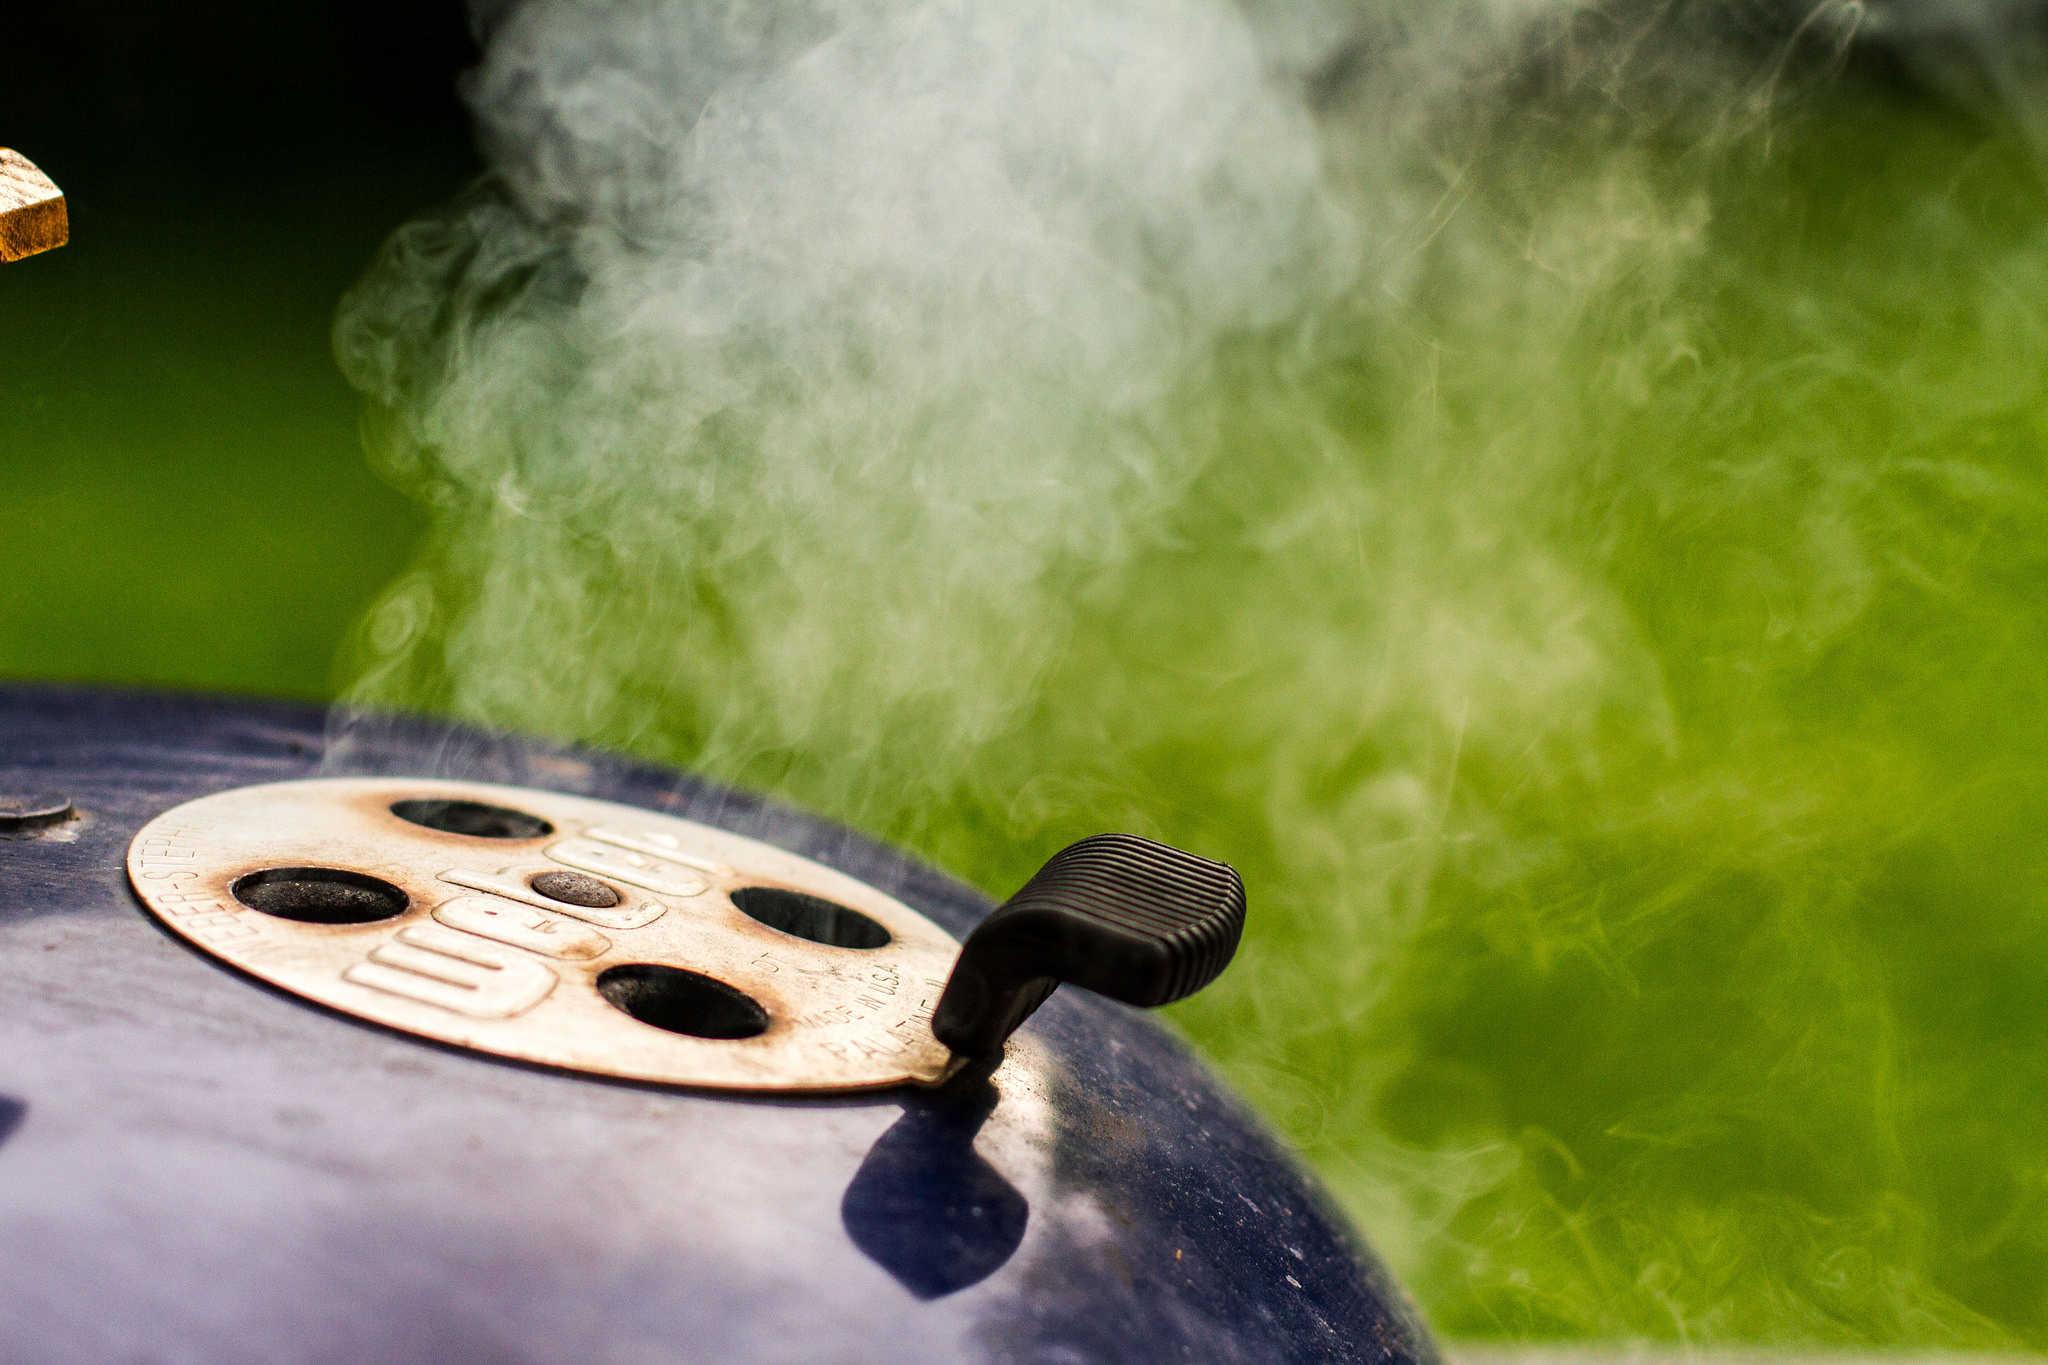 Elektro Gas Oder Holzkohlegrill : Der perfekte grill holzkohle elektro oder gas?